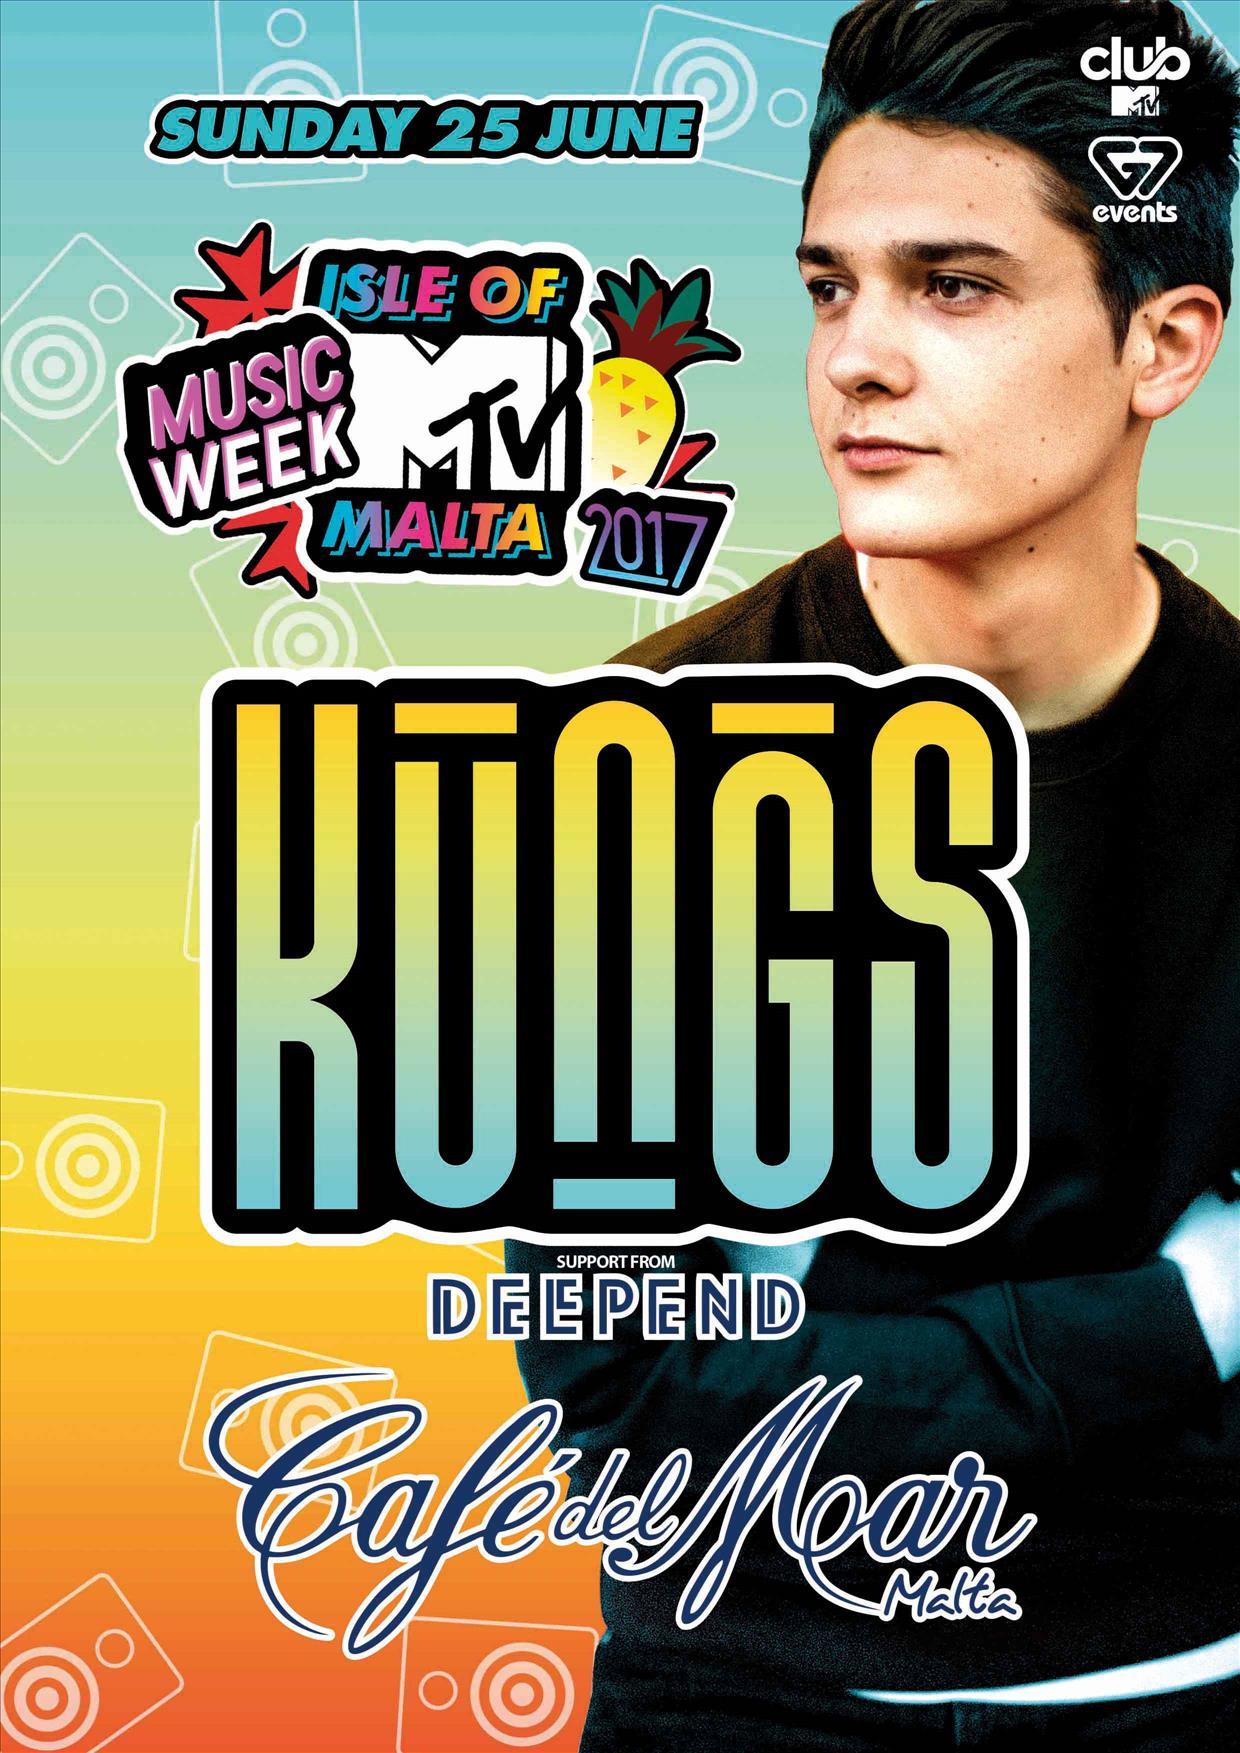 Isle of MTV Malta Music Week - KUNGS - Café Del Mar flyer